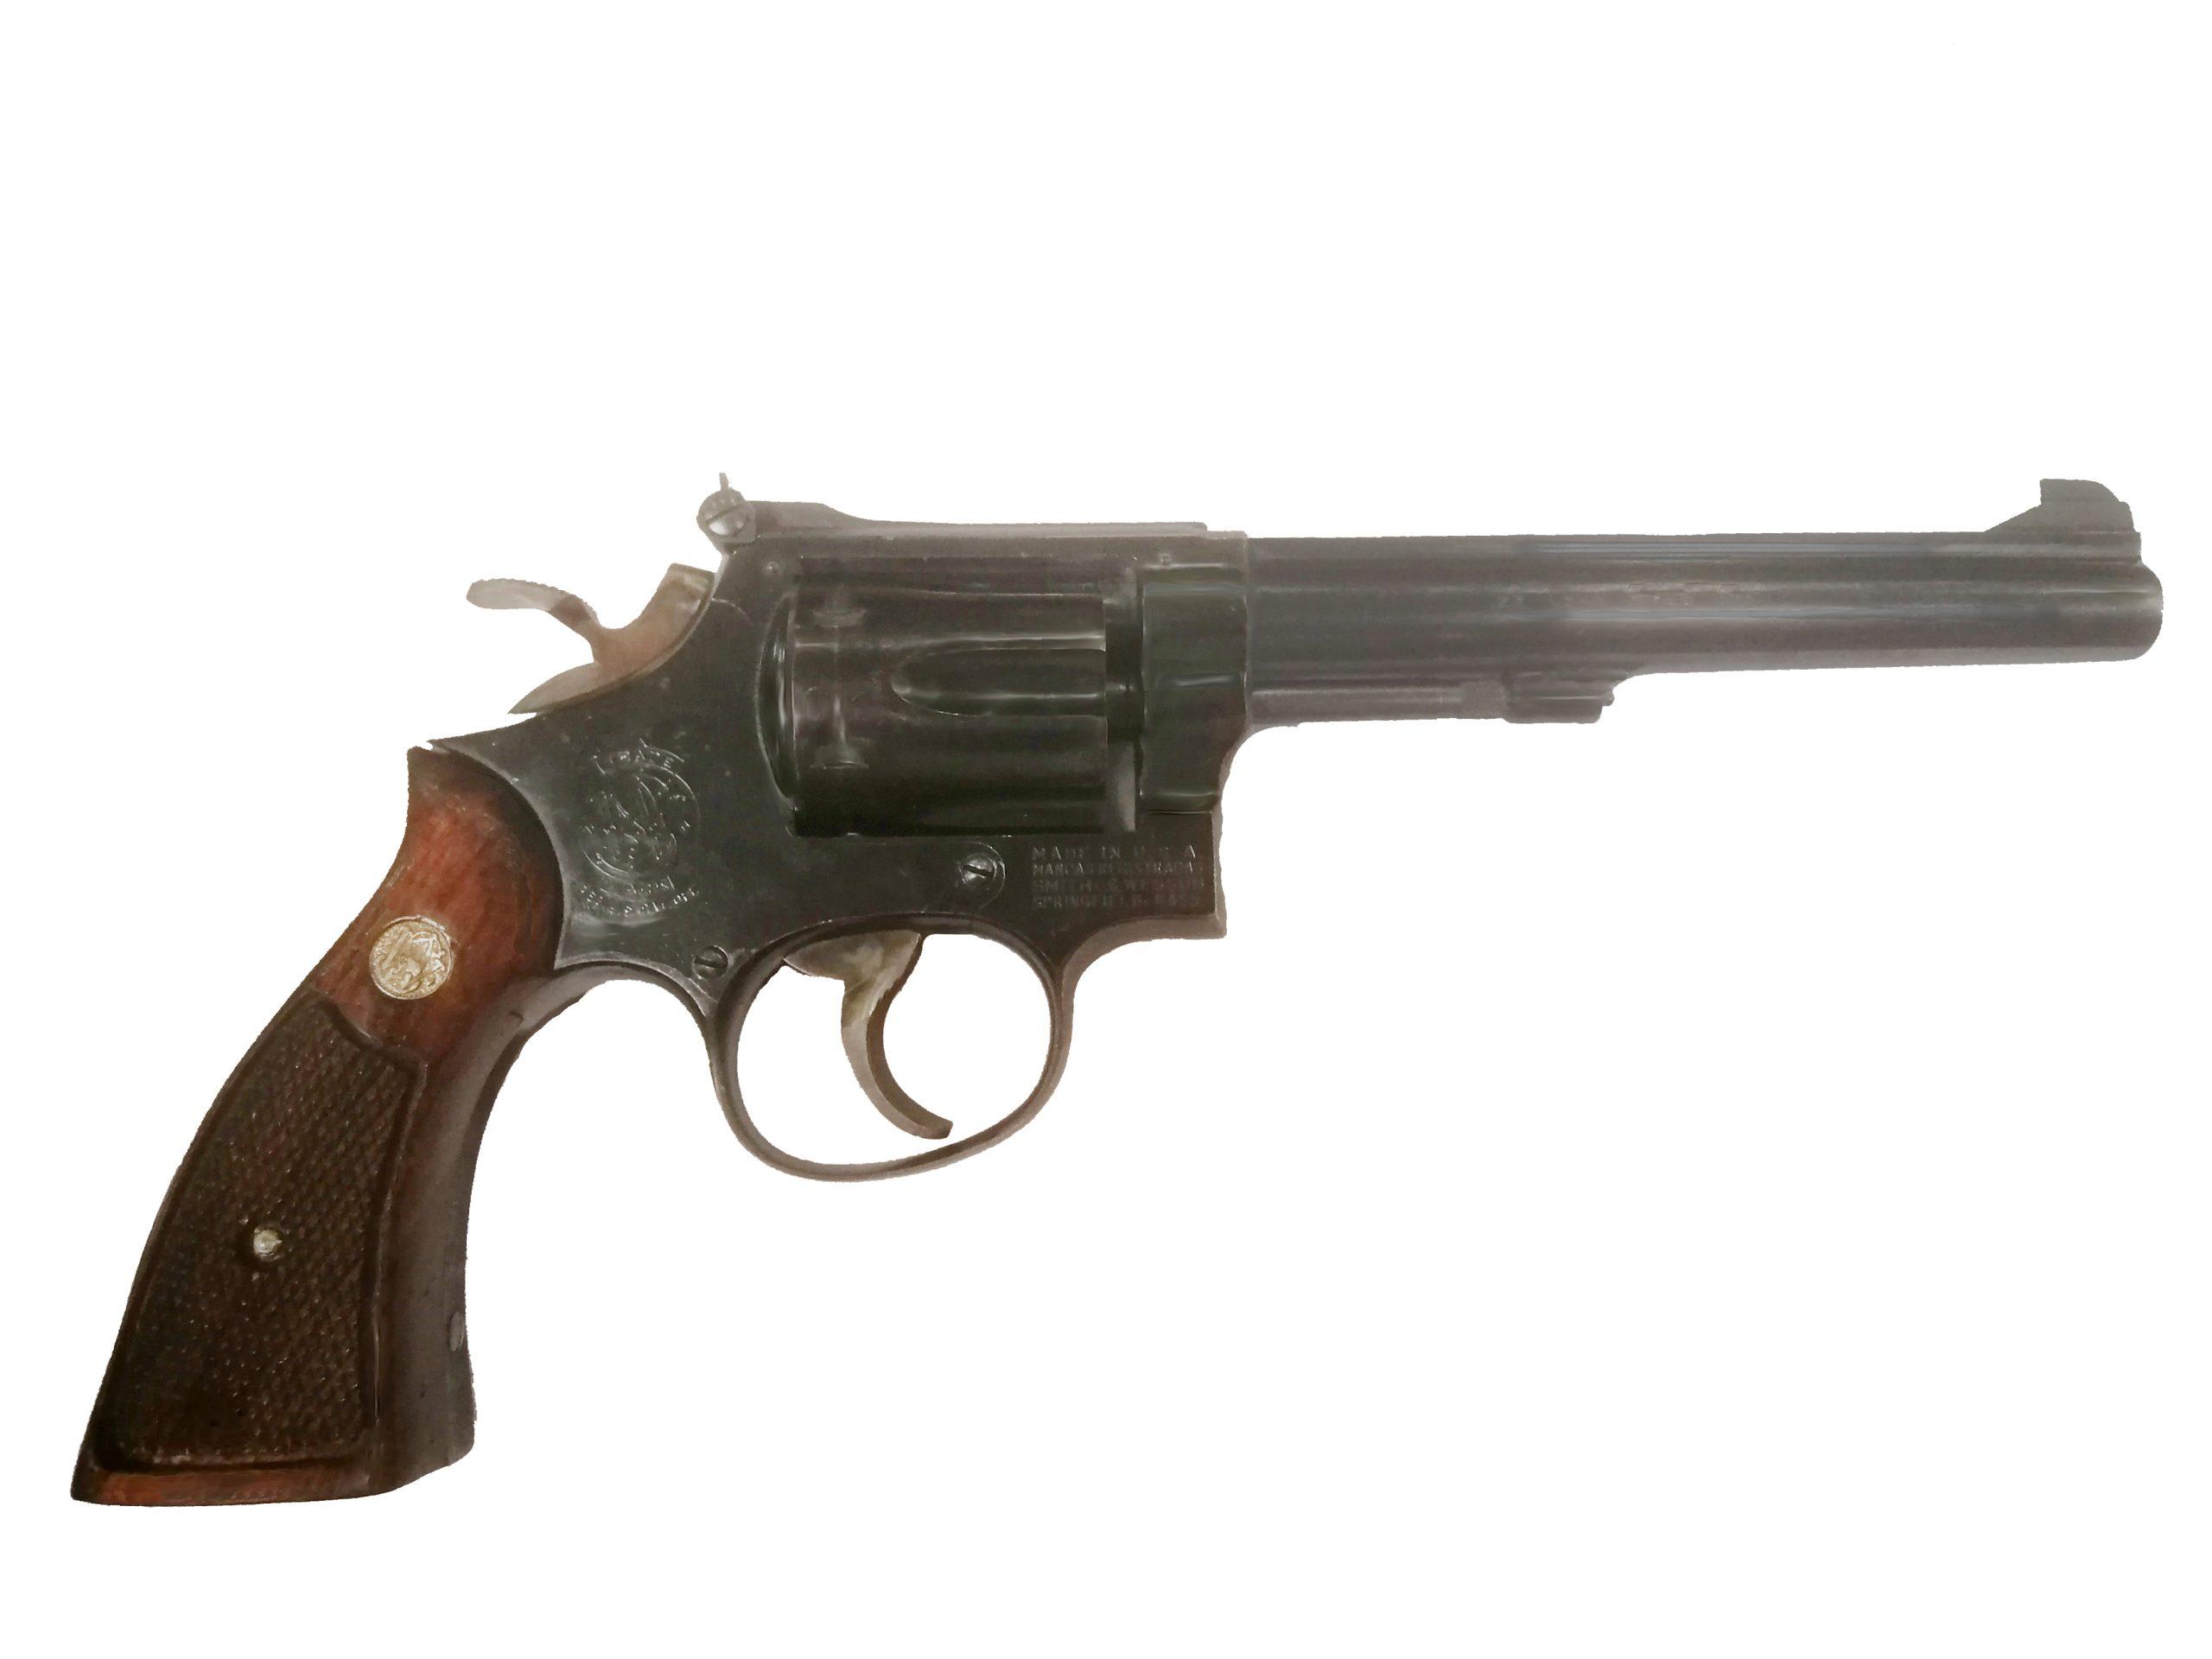 Revoler Smith Wesson modelo 17-2 K22 Masterpiece